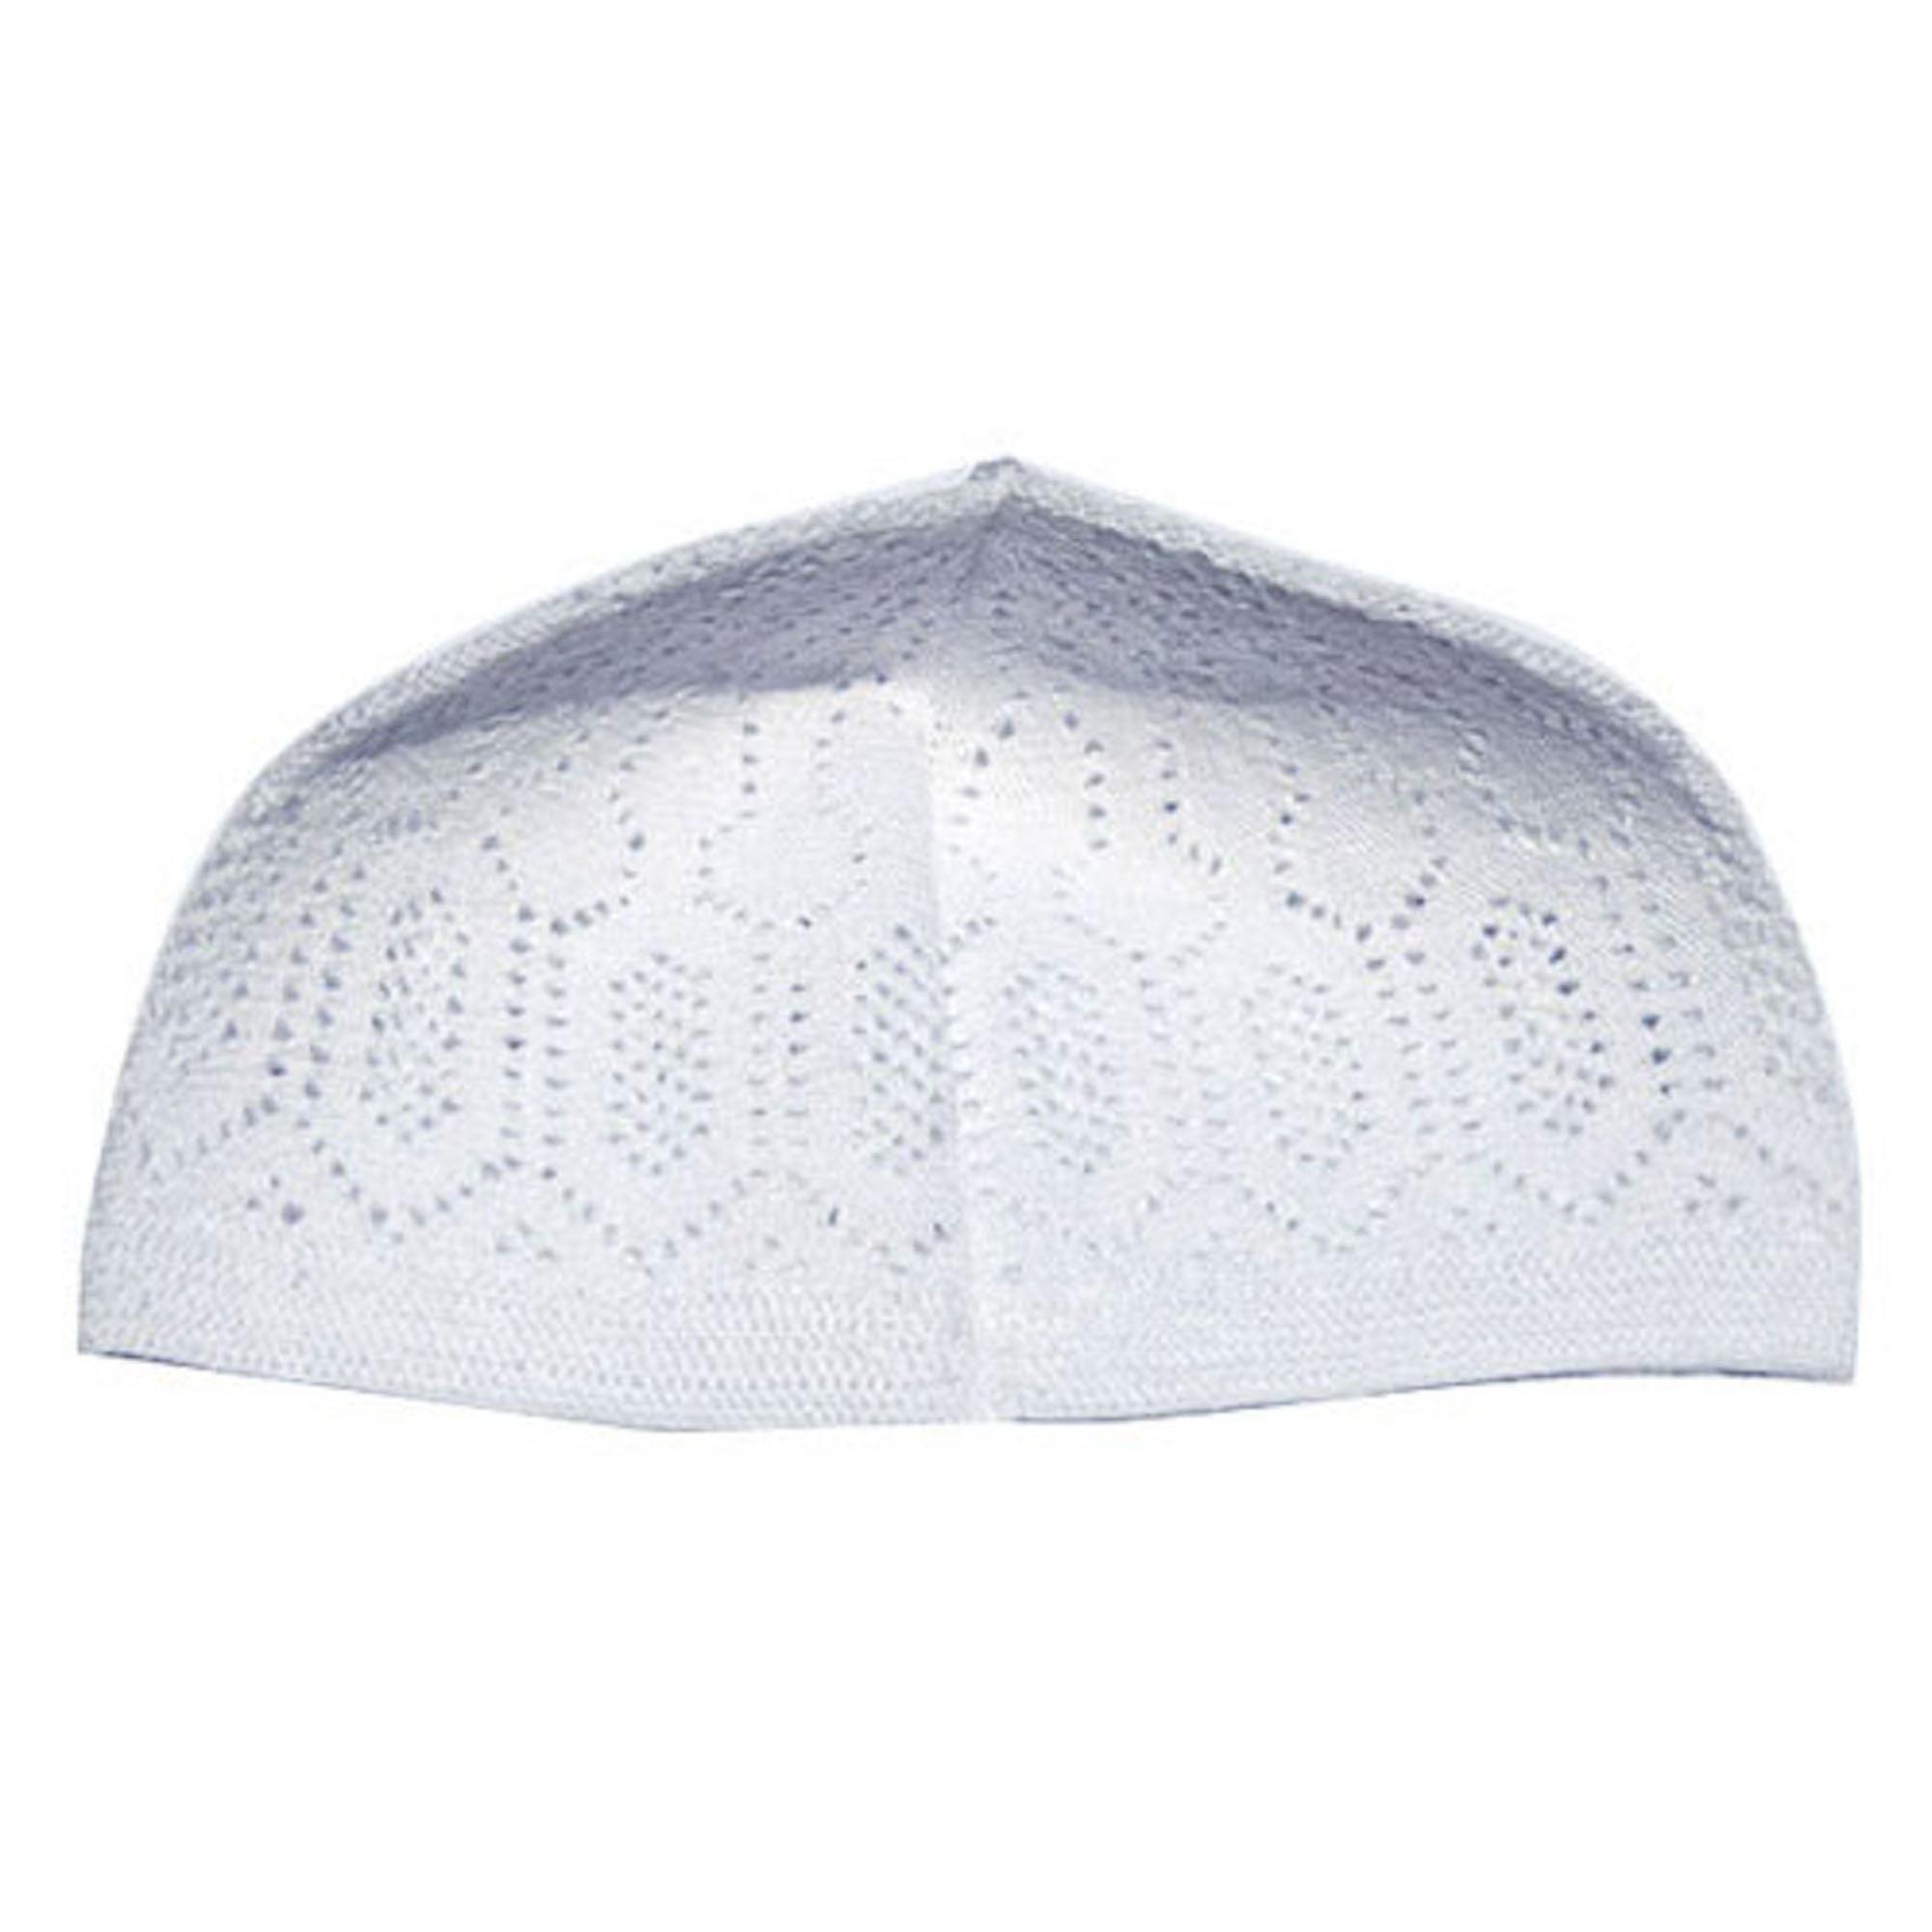 0-3 Months Baby Boys /& Baby Girls Personalized Cotton Thin-Style Beanie Hat Unisex Baby Custom Print Skull Cap